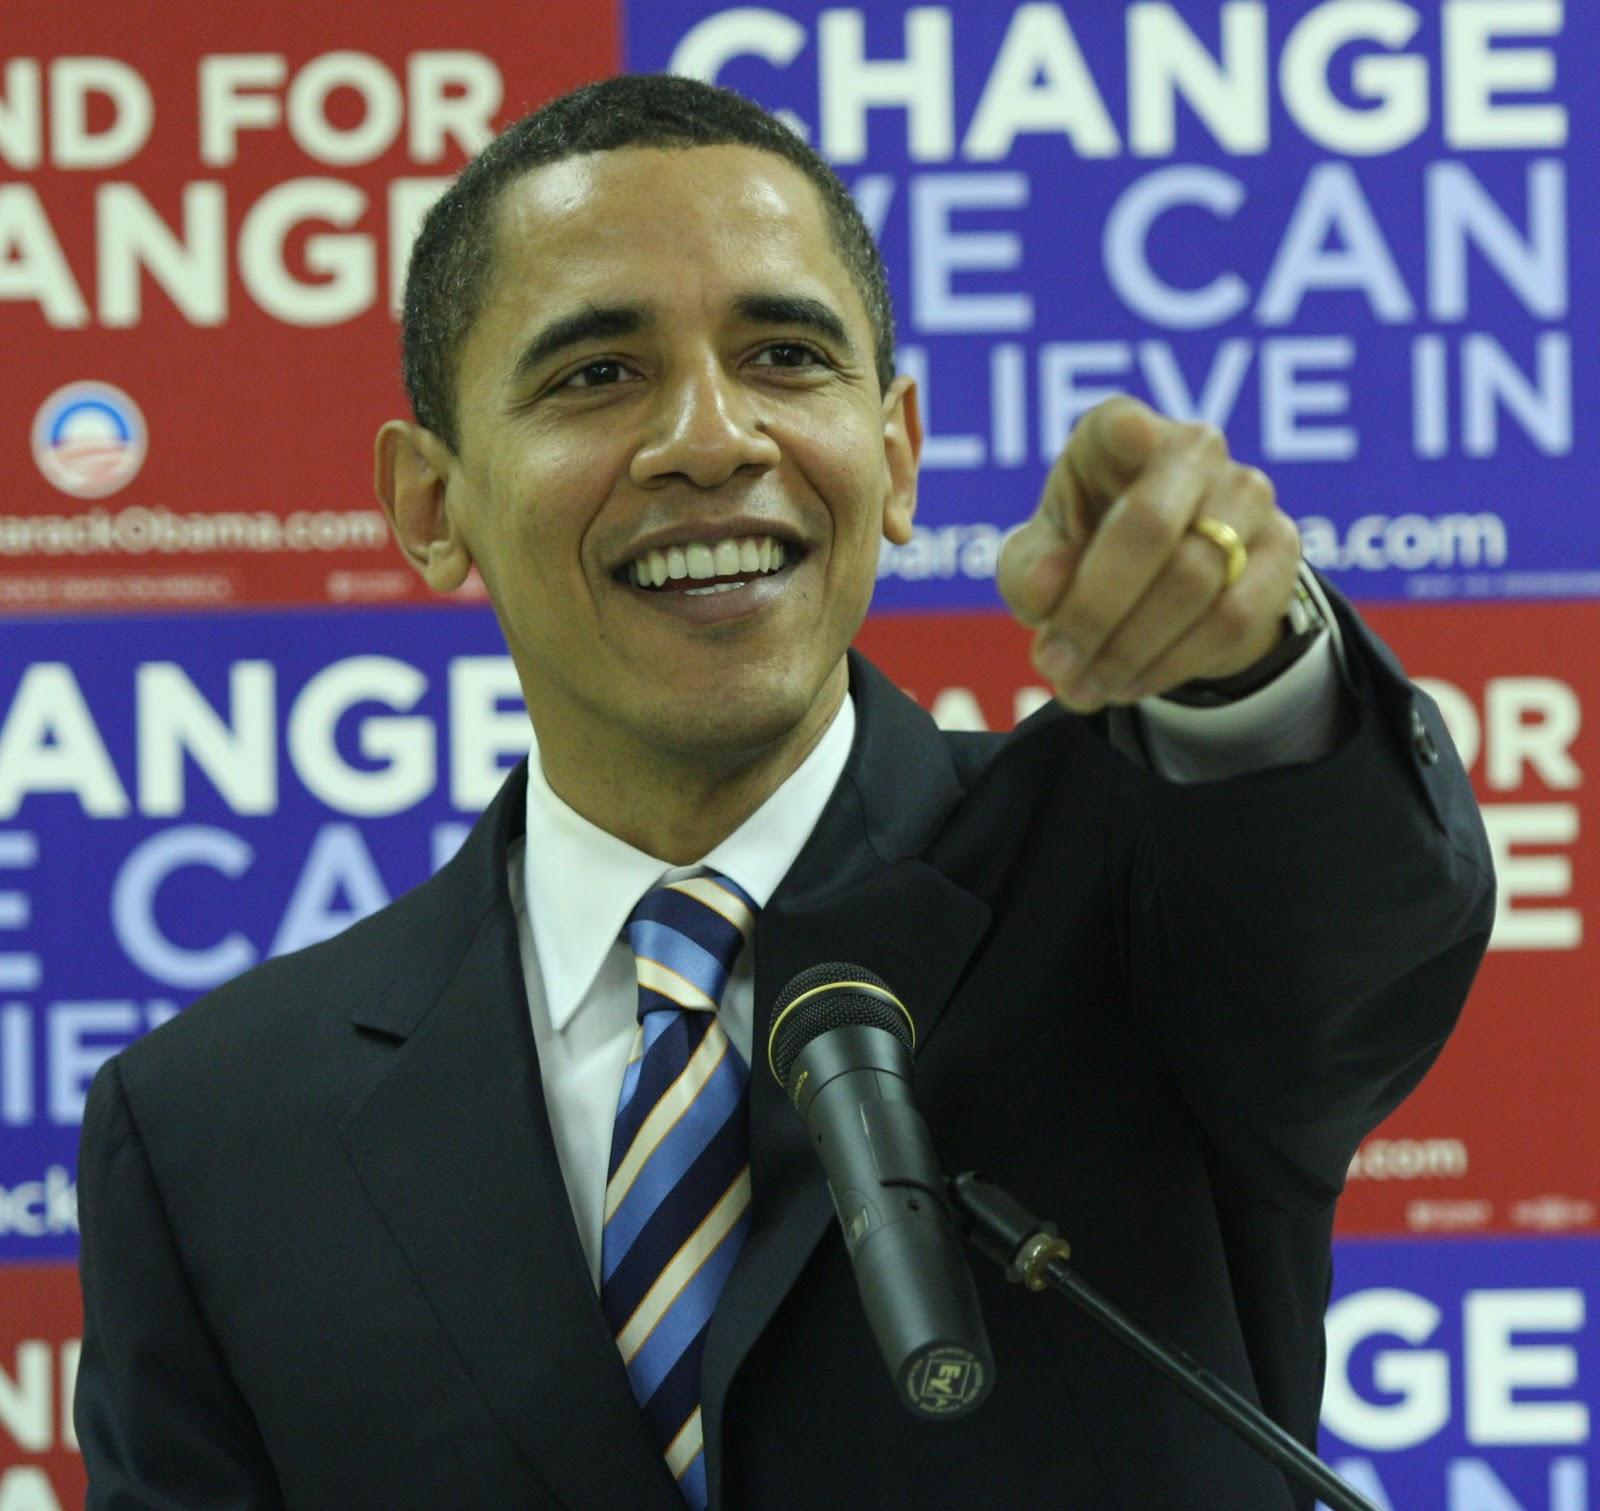 http://4.bp.blogspot.com/-kFaWe8T7al4/TWDpaY-wqKI/AAAAAAAAF_c/pFOO8o3uJuQ/s1600/obama1.jpg